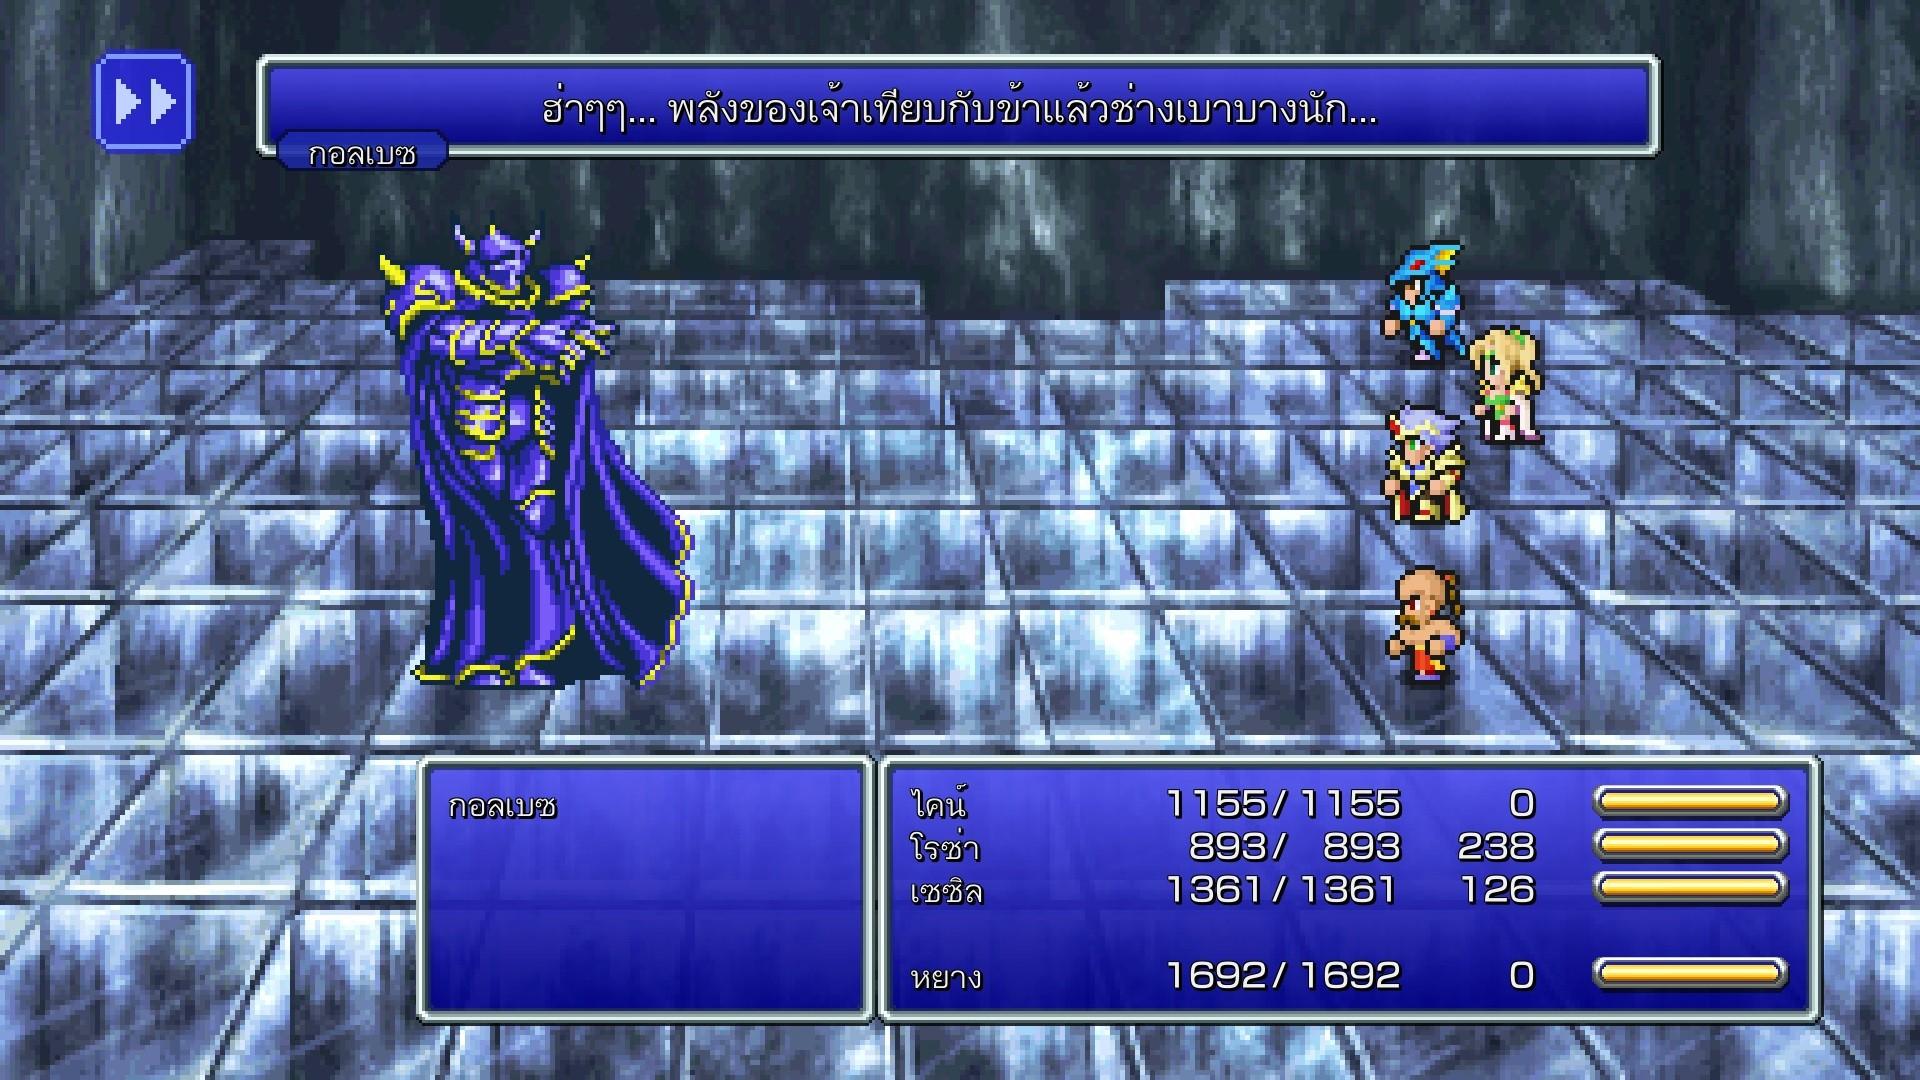 Final Fantasy IV Pixel Remaster 2582021 4